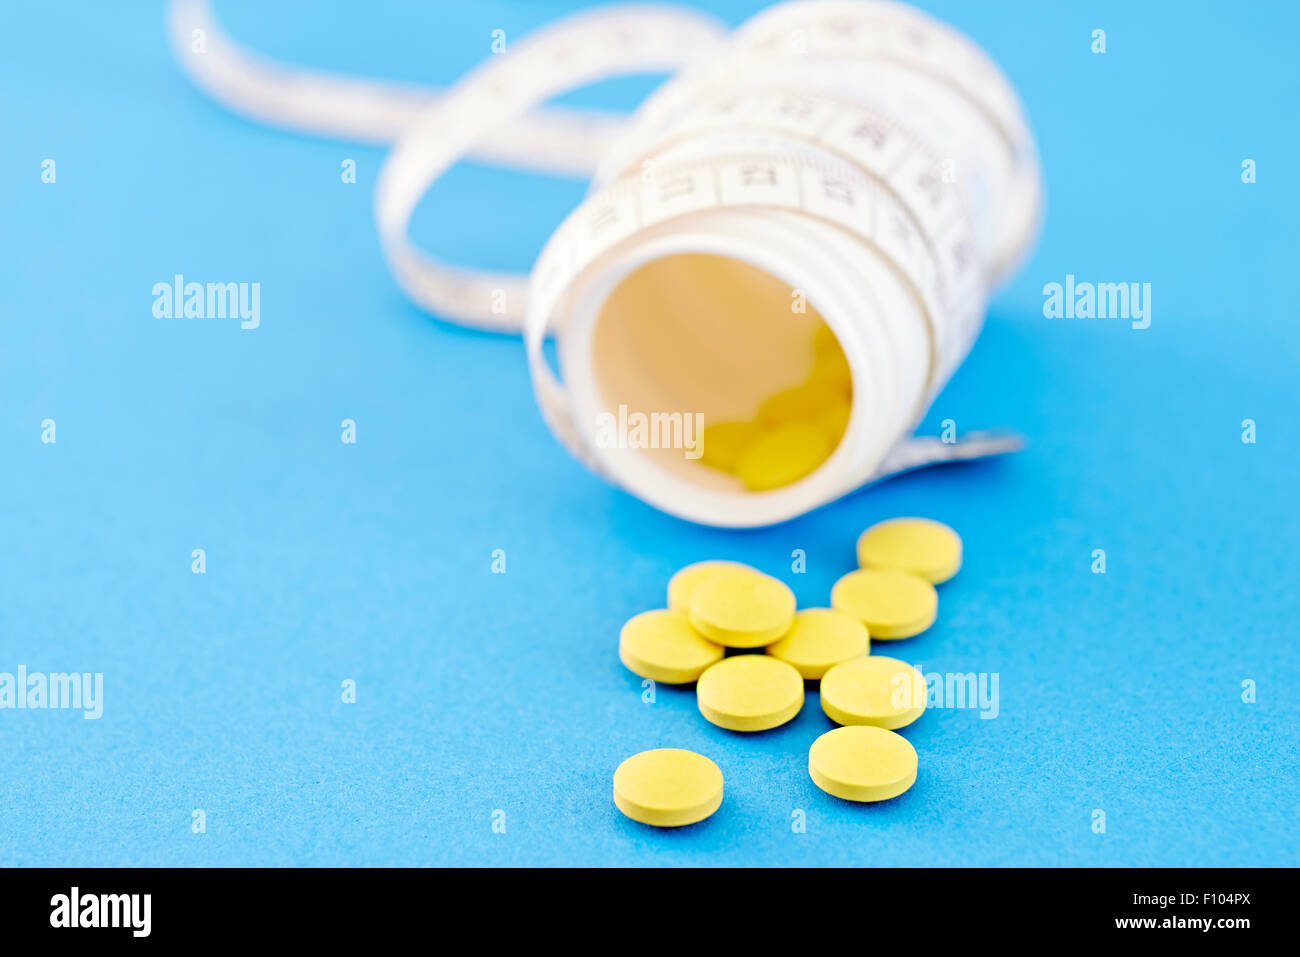 SLIMMING TREATMENT - Stock Image